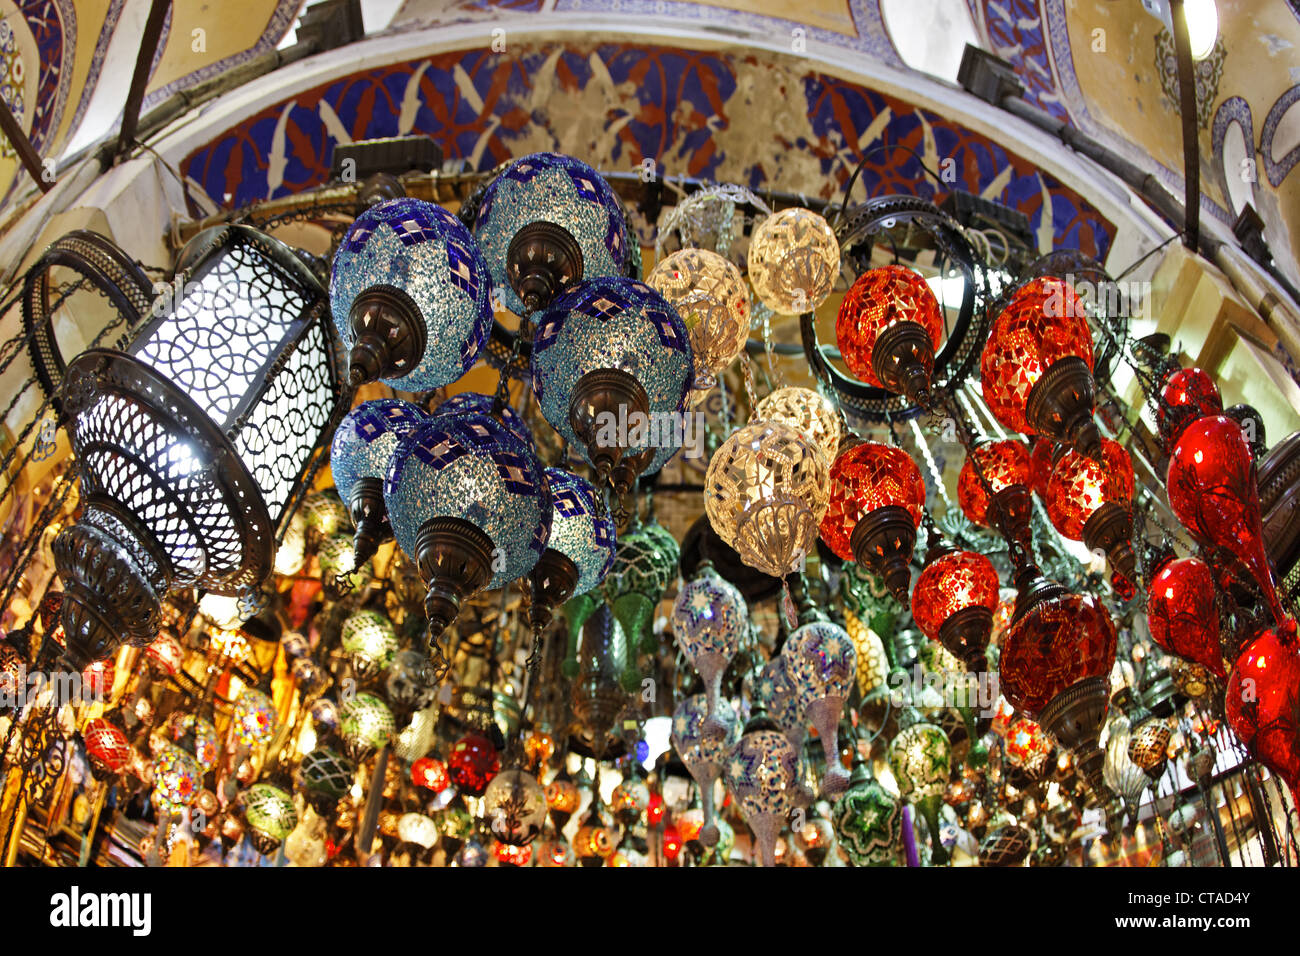 Istanbul grand bazaar immagini istanbul grand bazaar fotos stock alamy - Istanbul bagno turco ...